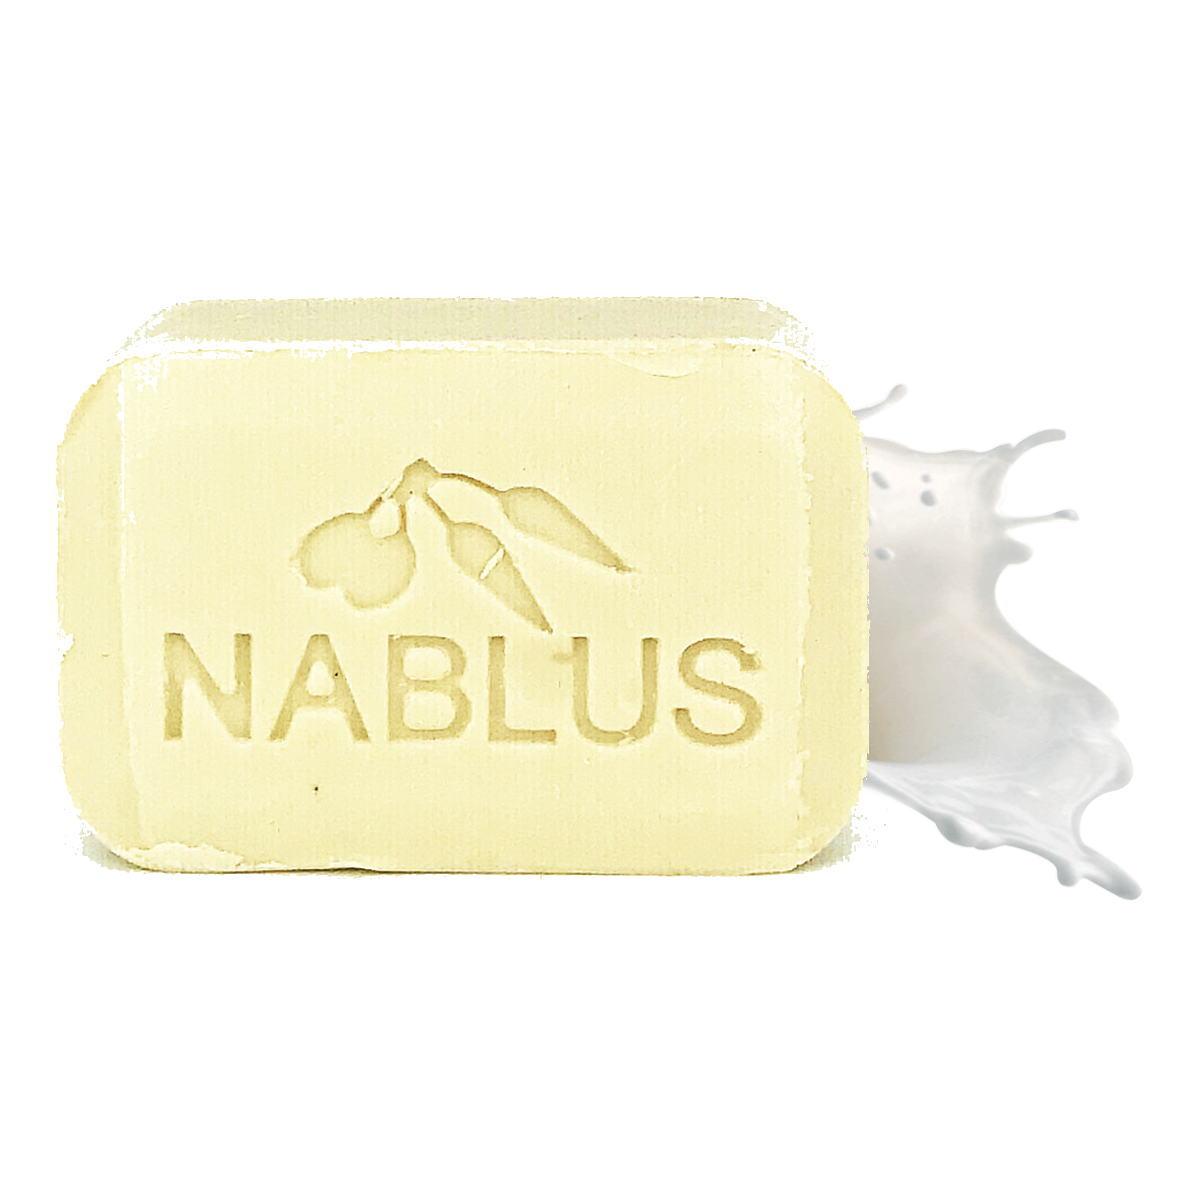 Nablus Soap ナーブルスソープ - 山羊ミルク - 無添加 オーガニック石鹸